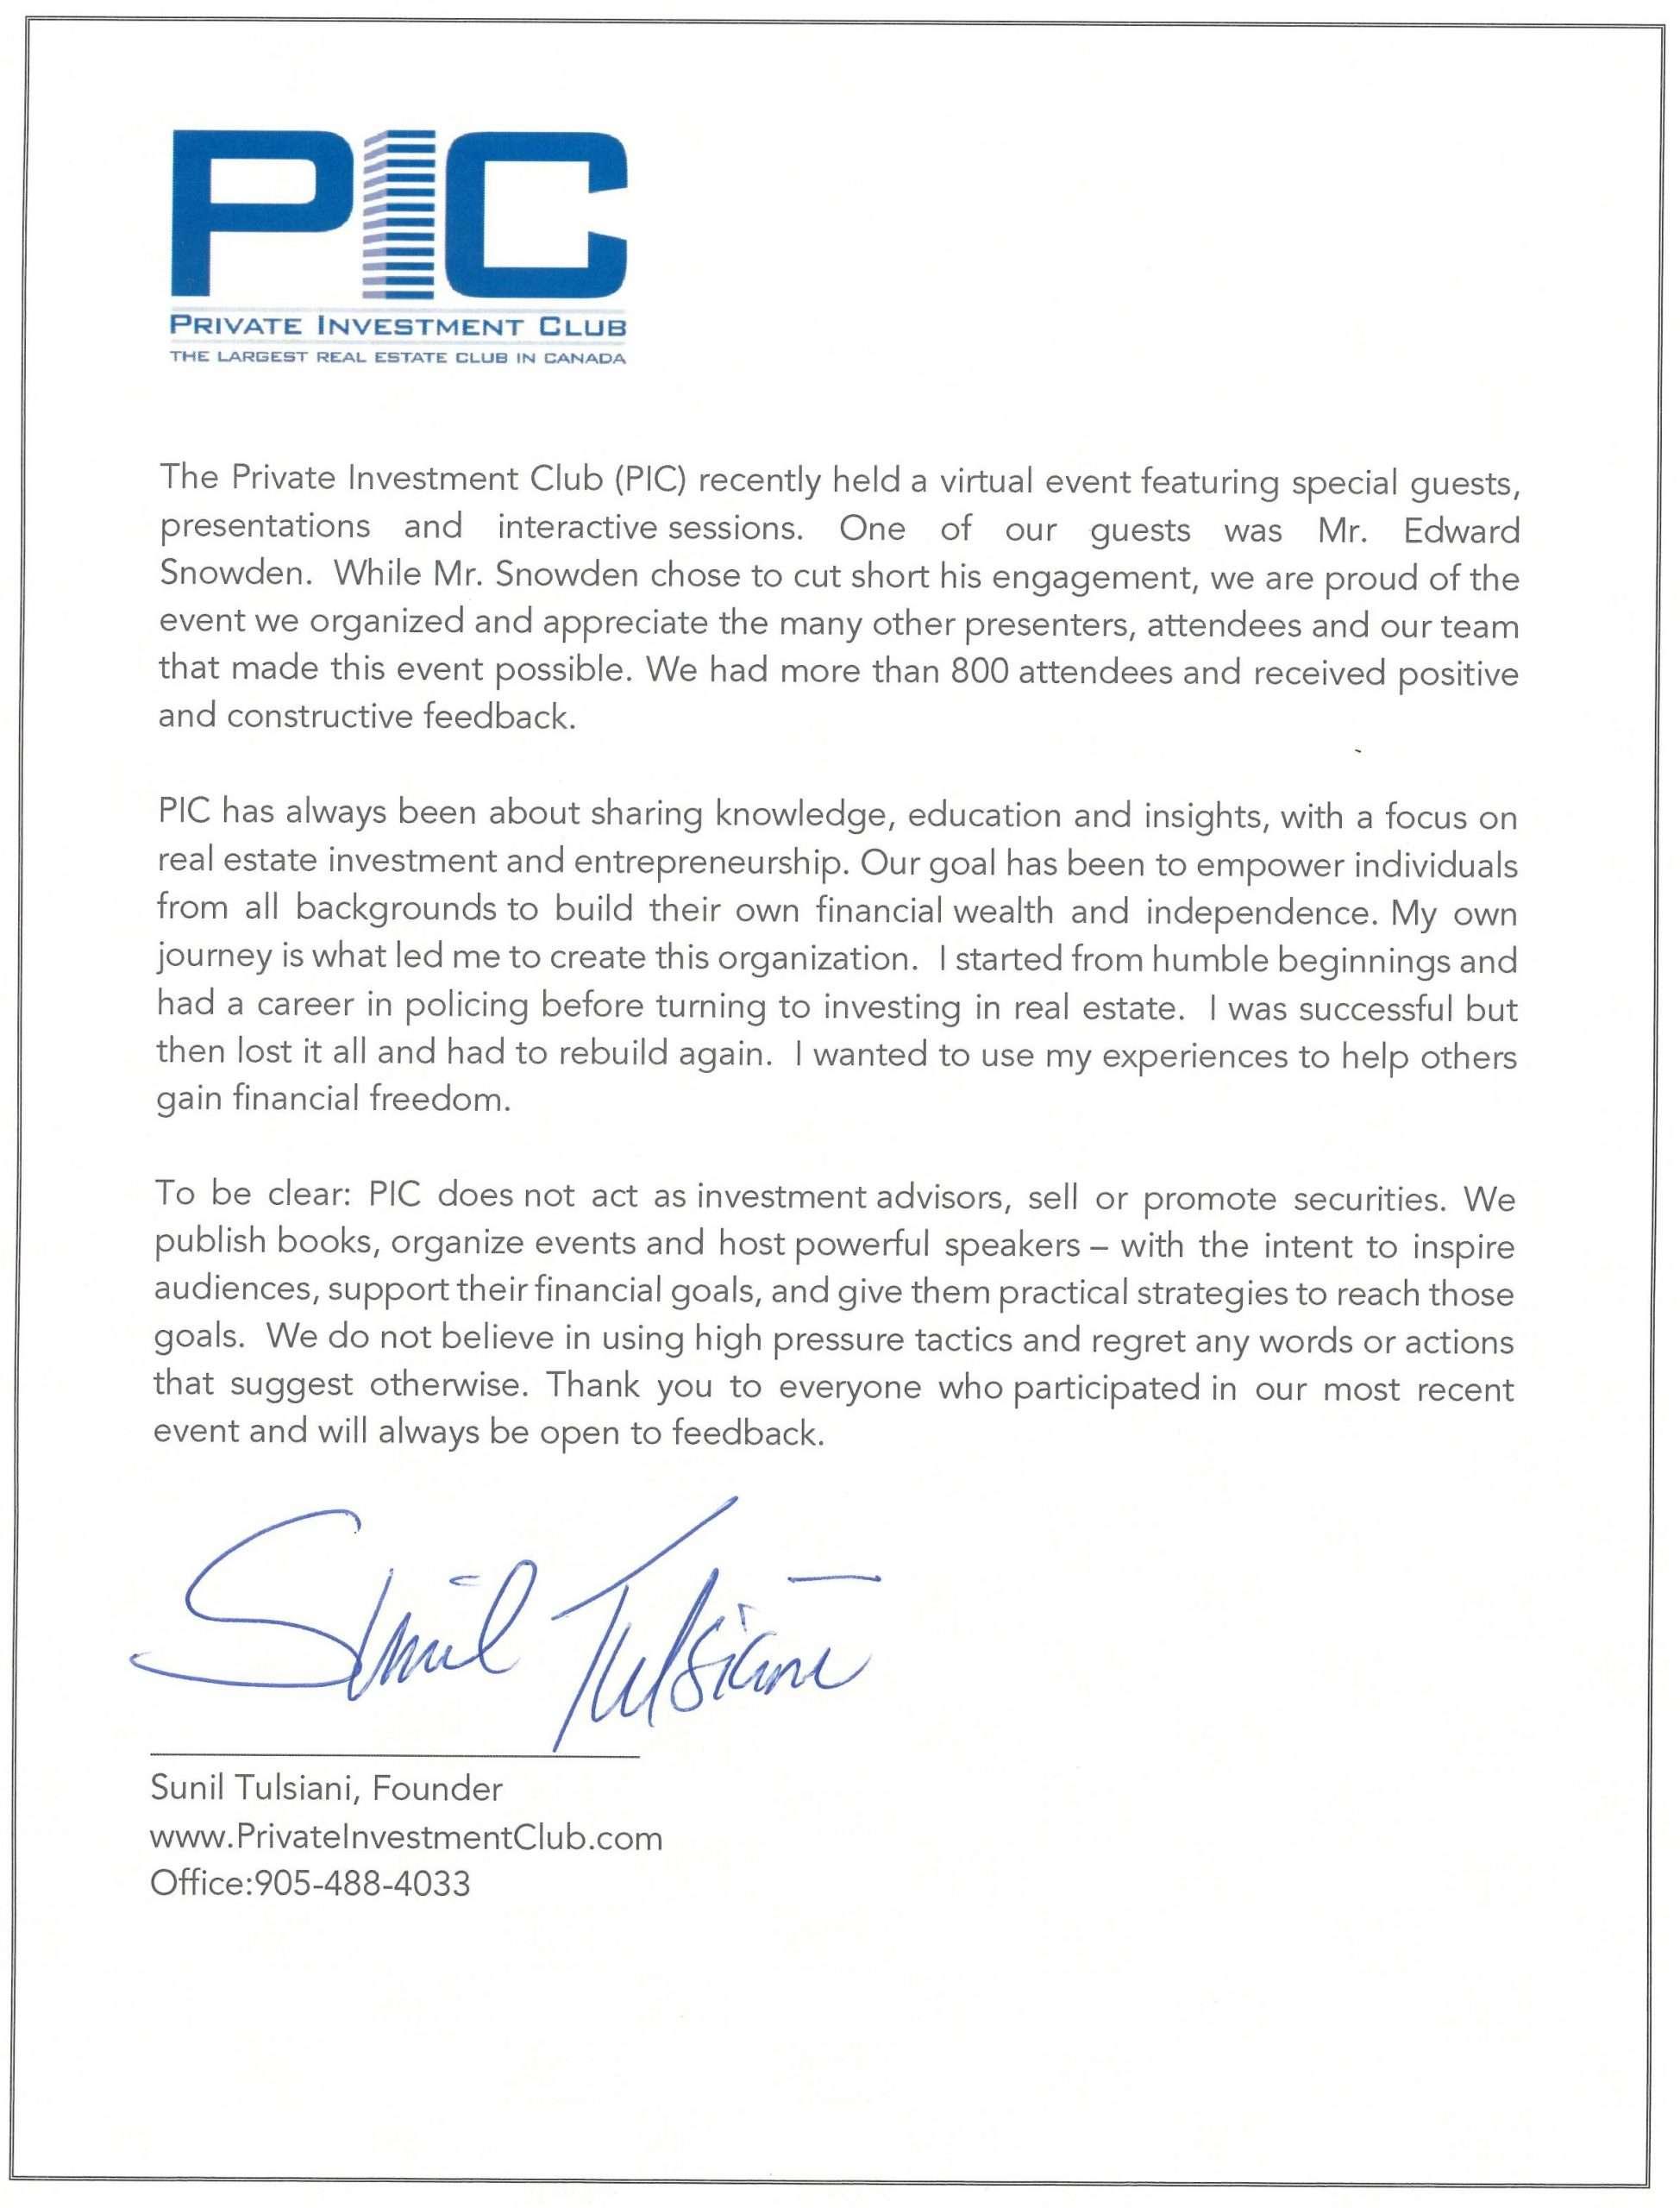 Sunil Tulsiani Letter